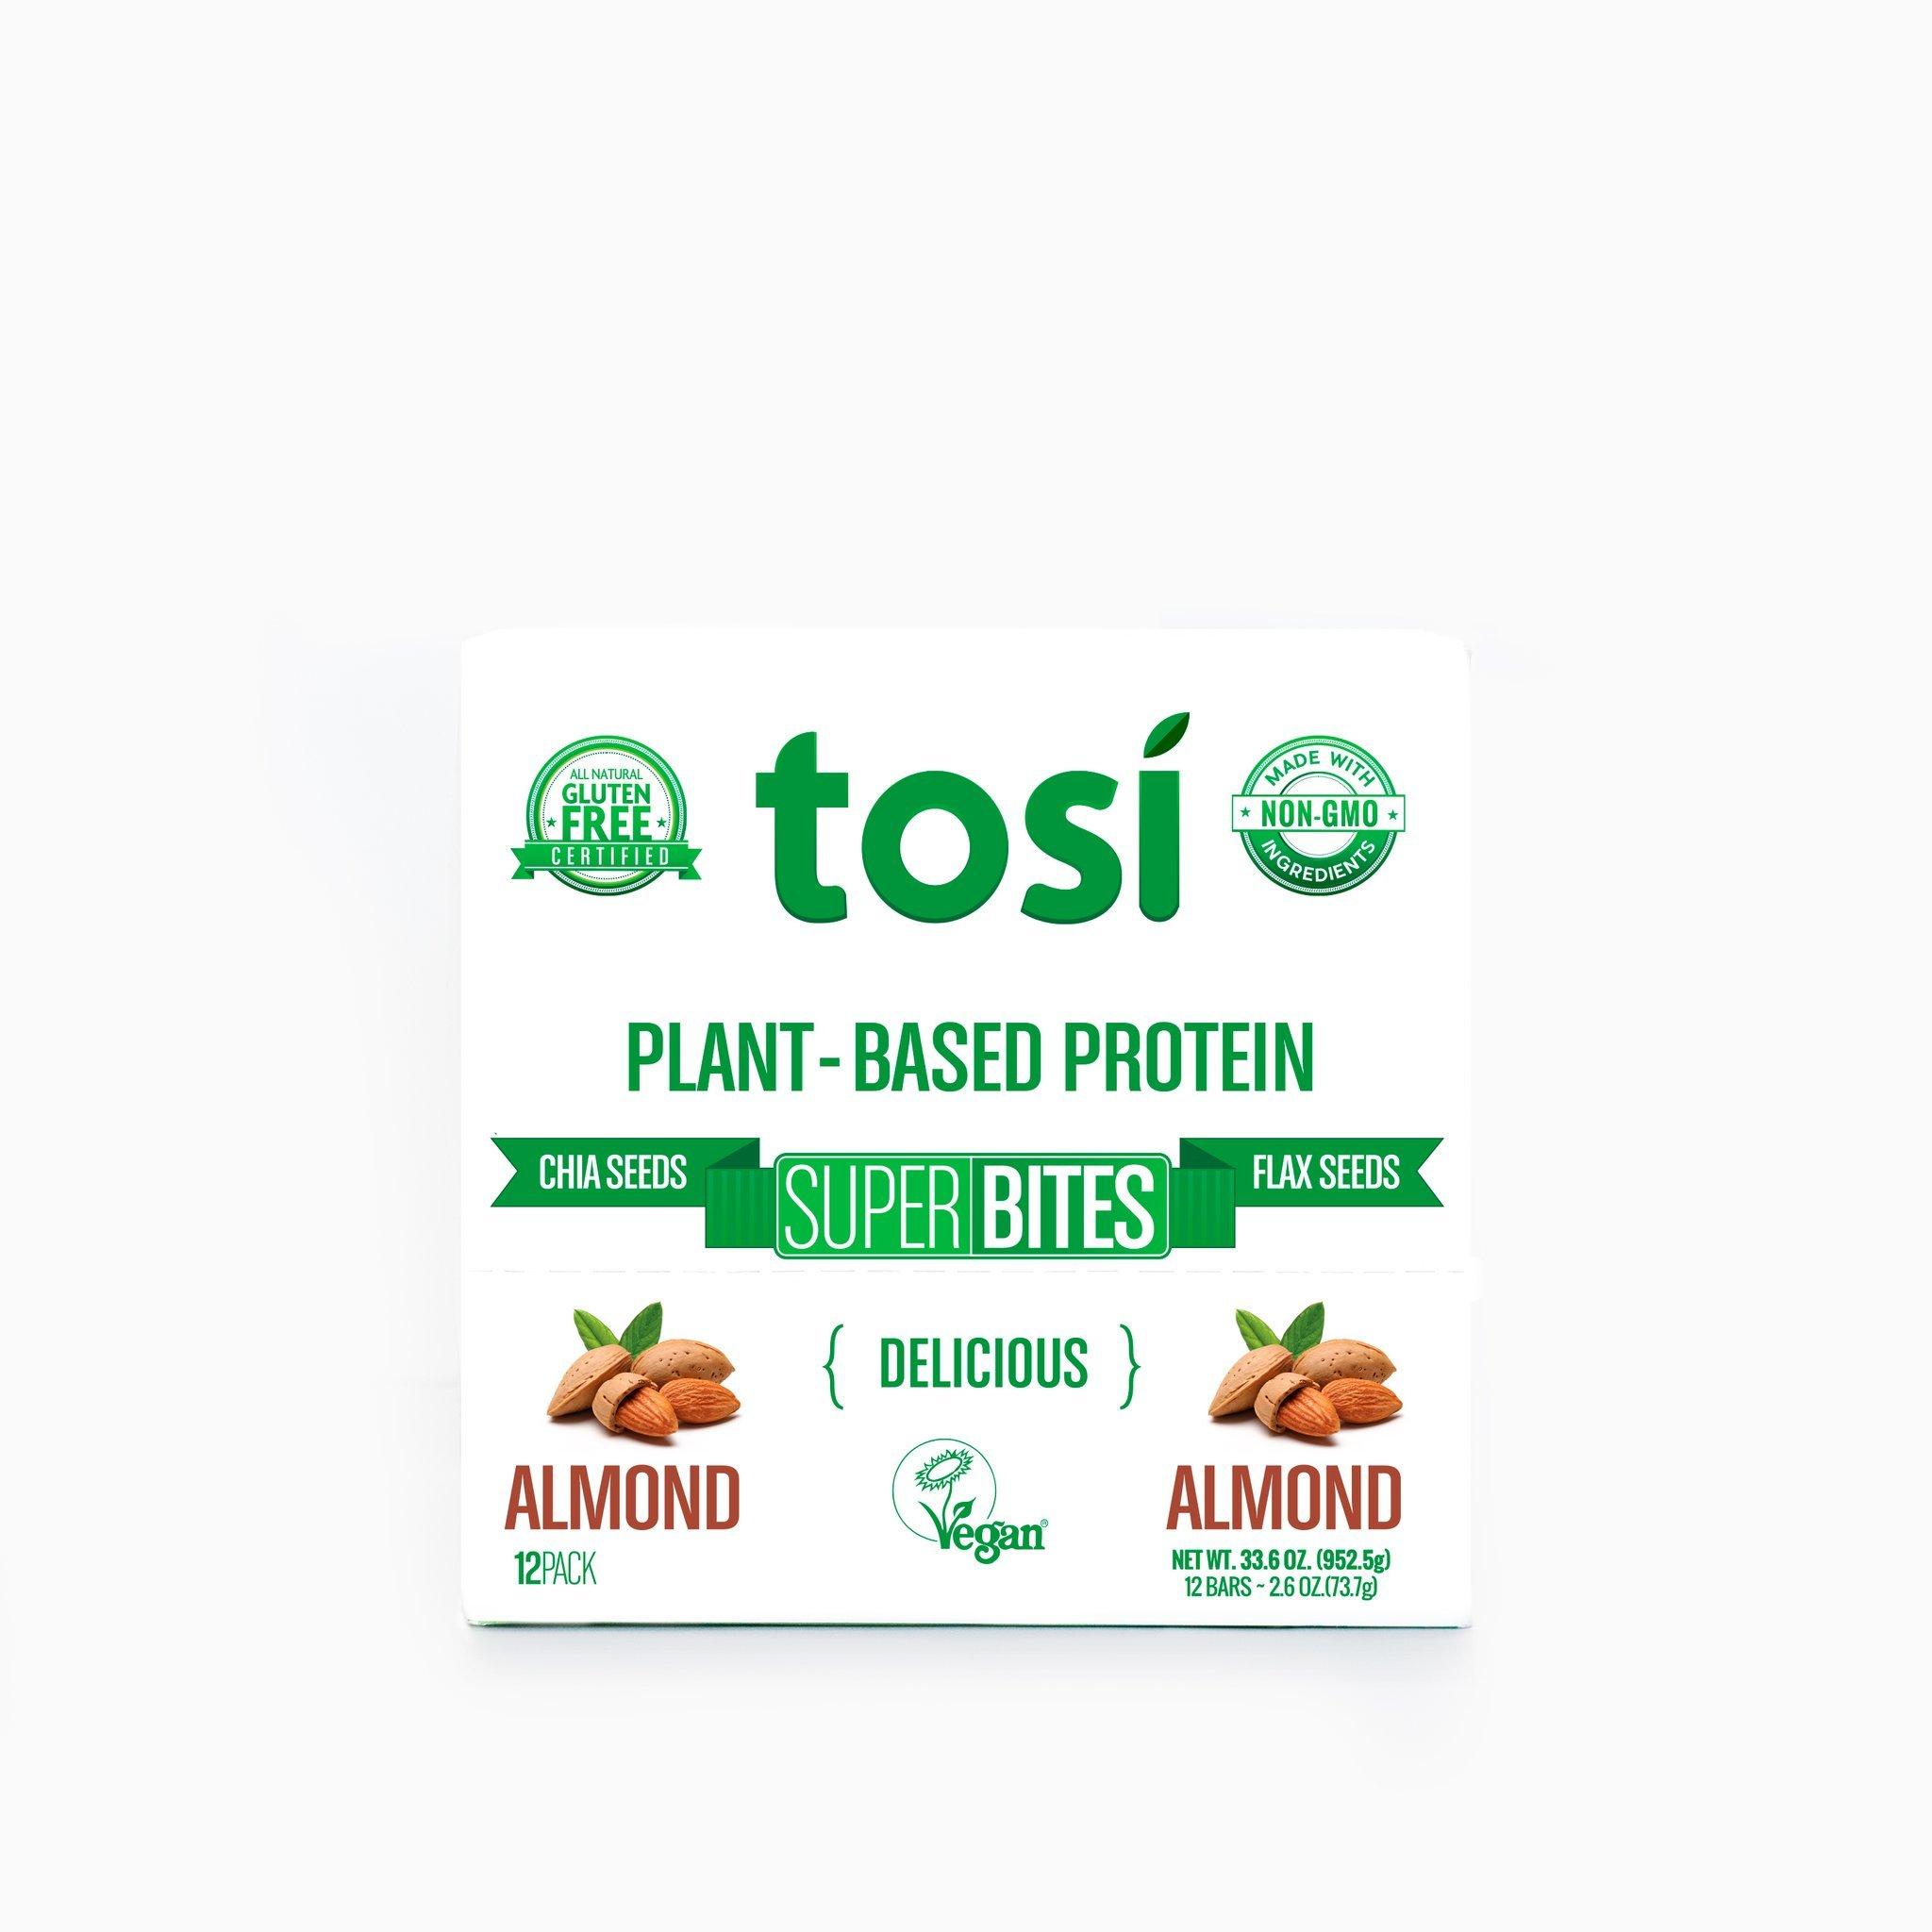 Tosi SuperBites Almond, 2.6 oz Bar, 12 Count Pack | Vegan, Plant-Based, Gluten Free, Omega 3's and Fiber